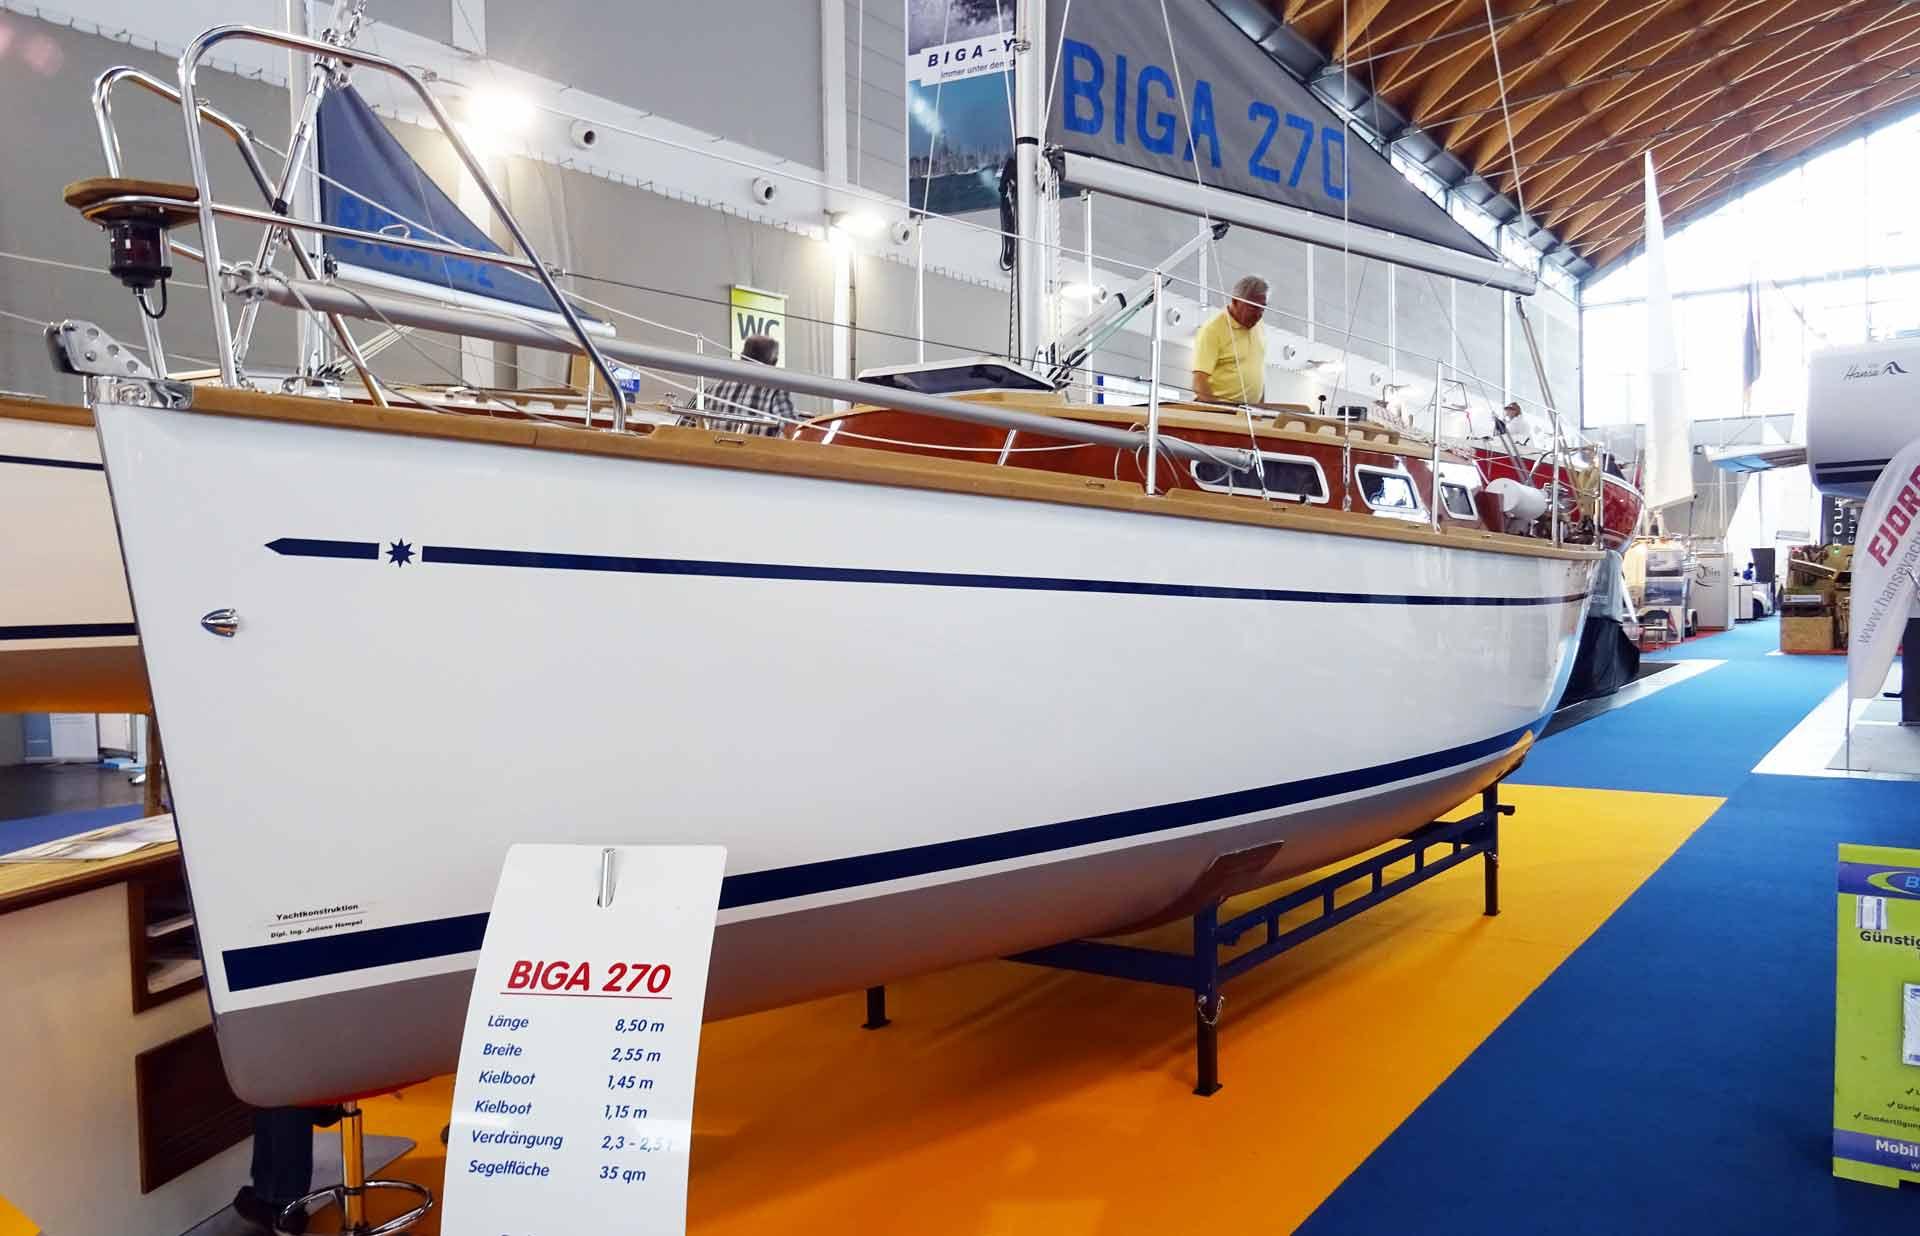 Last but lot least: The Biga 270